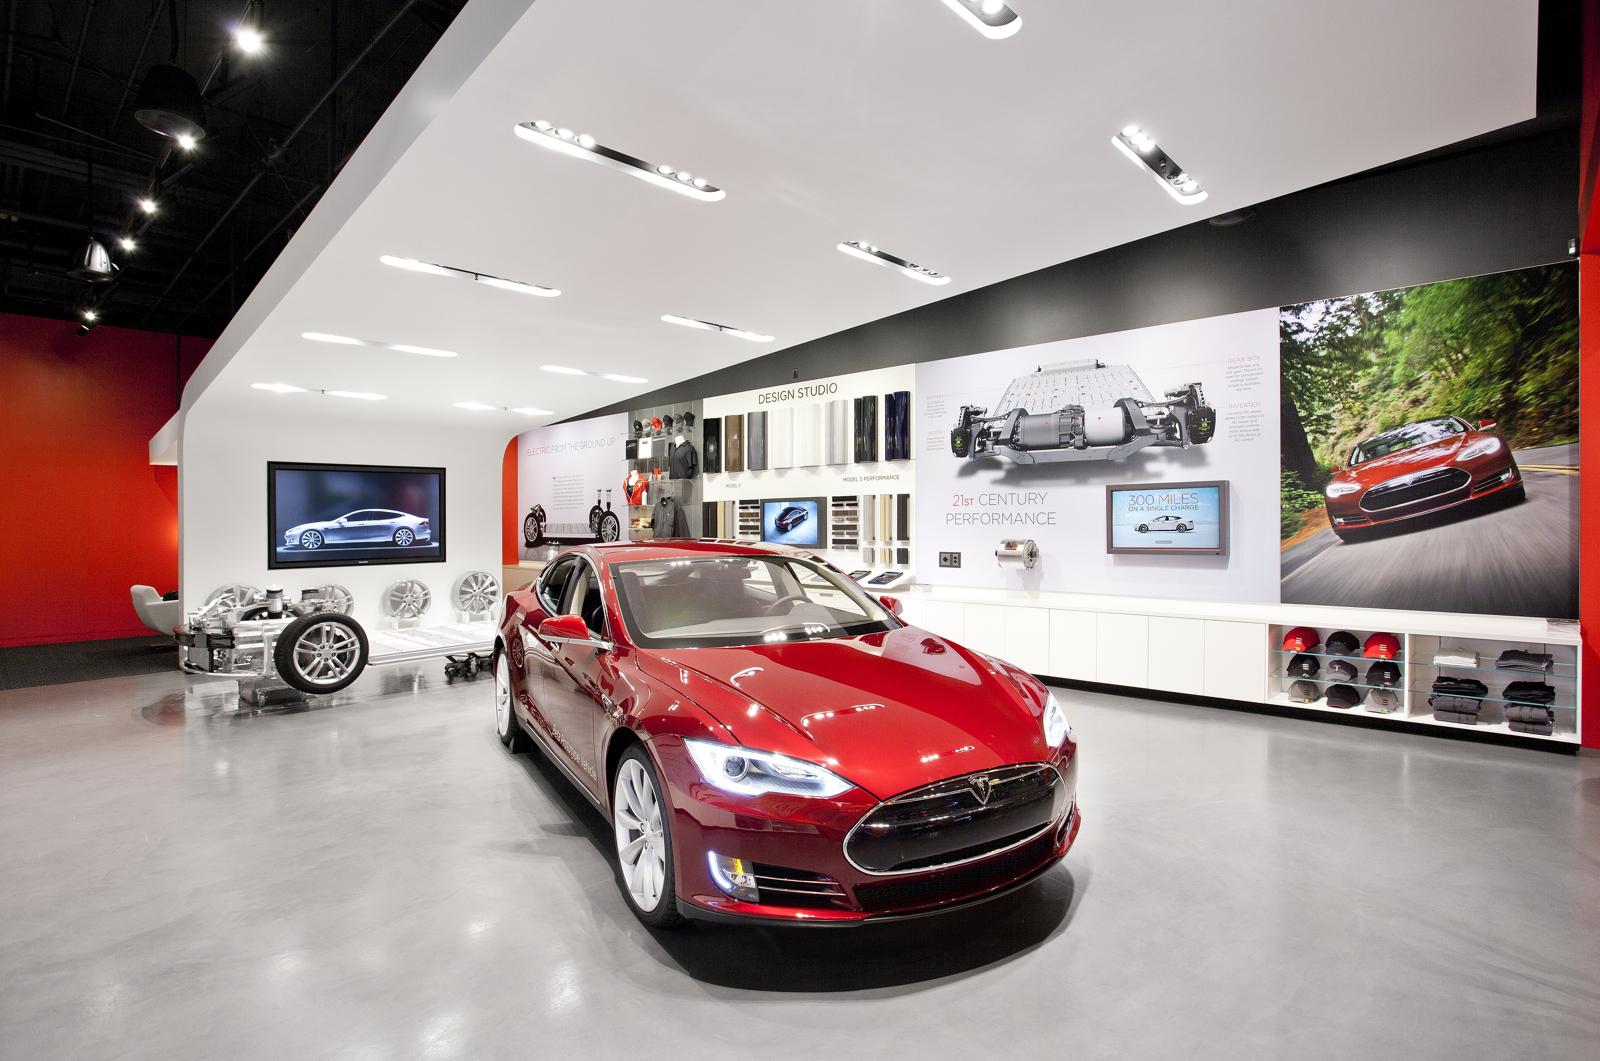 Honda Dealership Houston >> Auto Dealer Groups Escalate Battle Against Tesla Stores